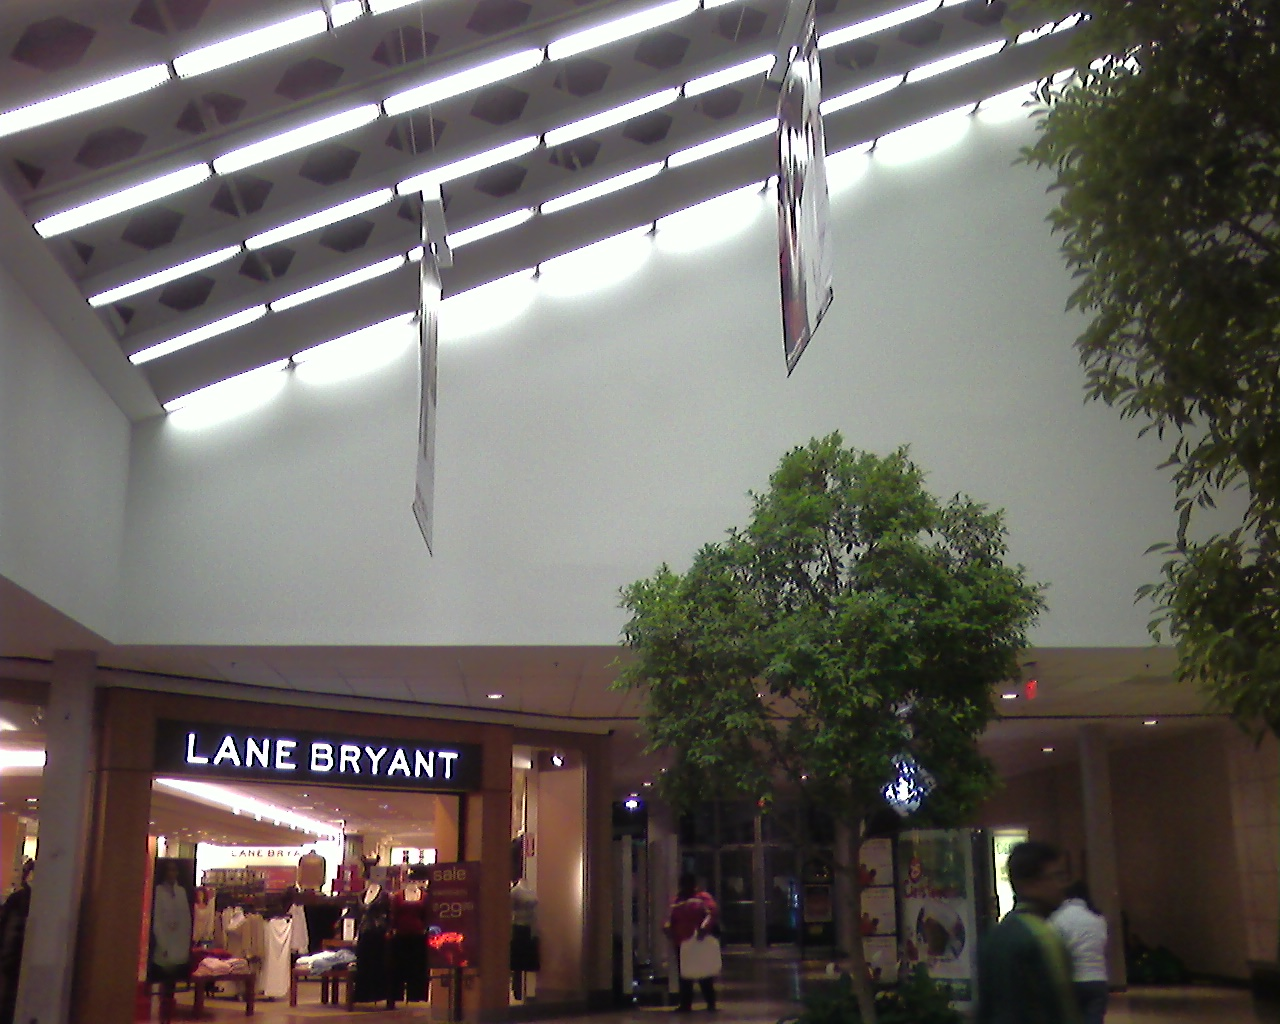 willowbrook mall wayne new jersey labelscar